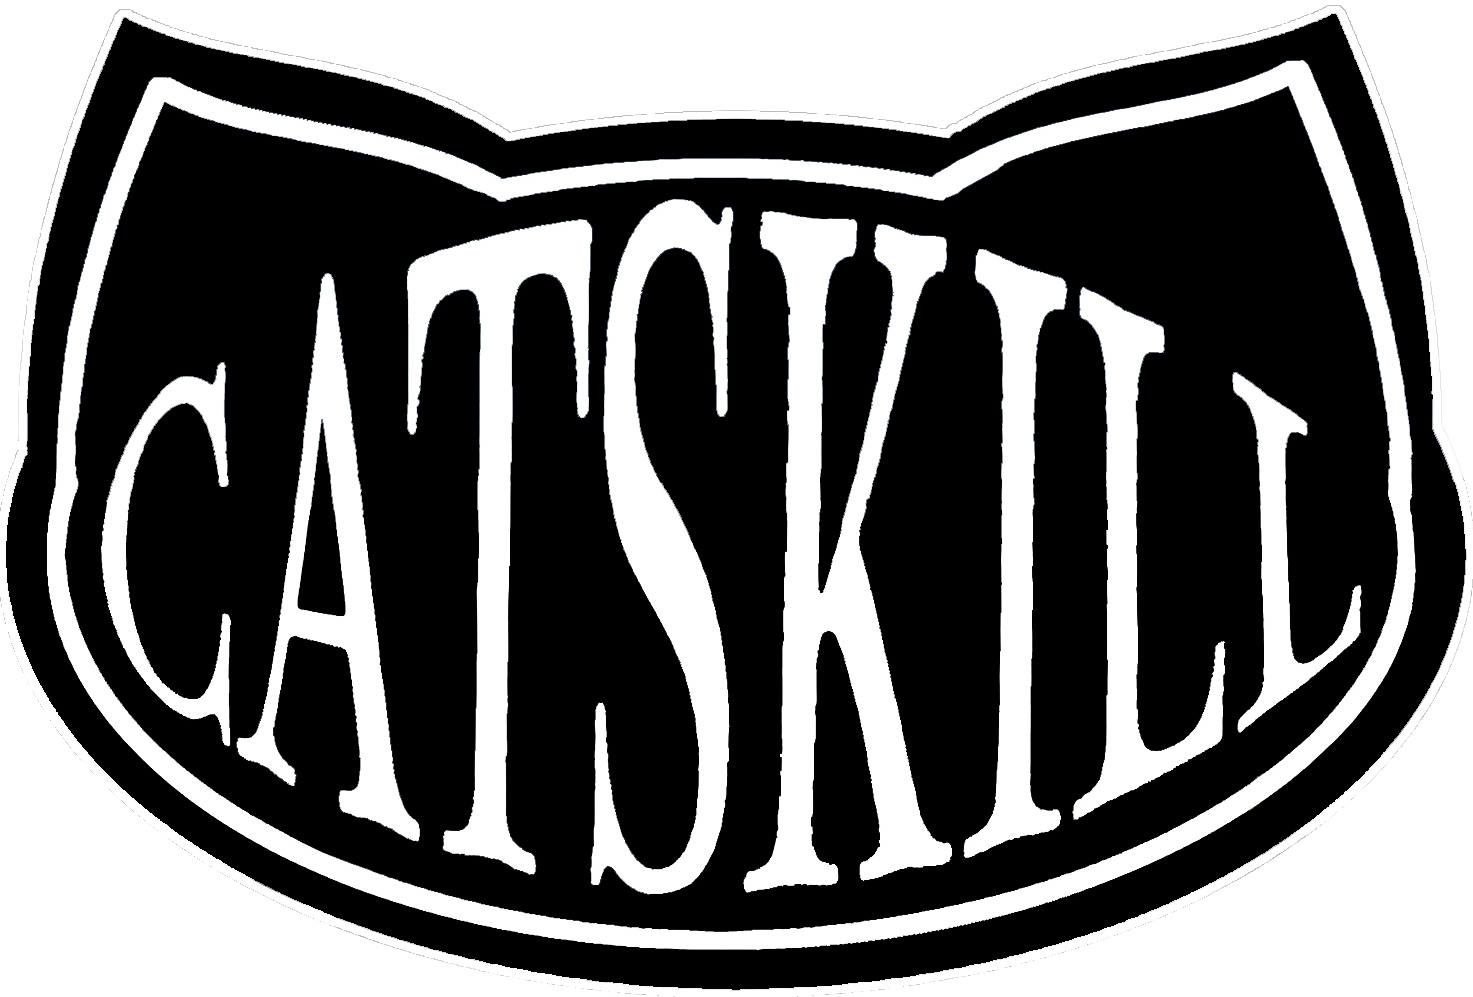 newcatskillsticker.jpg